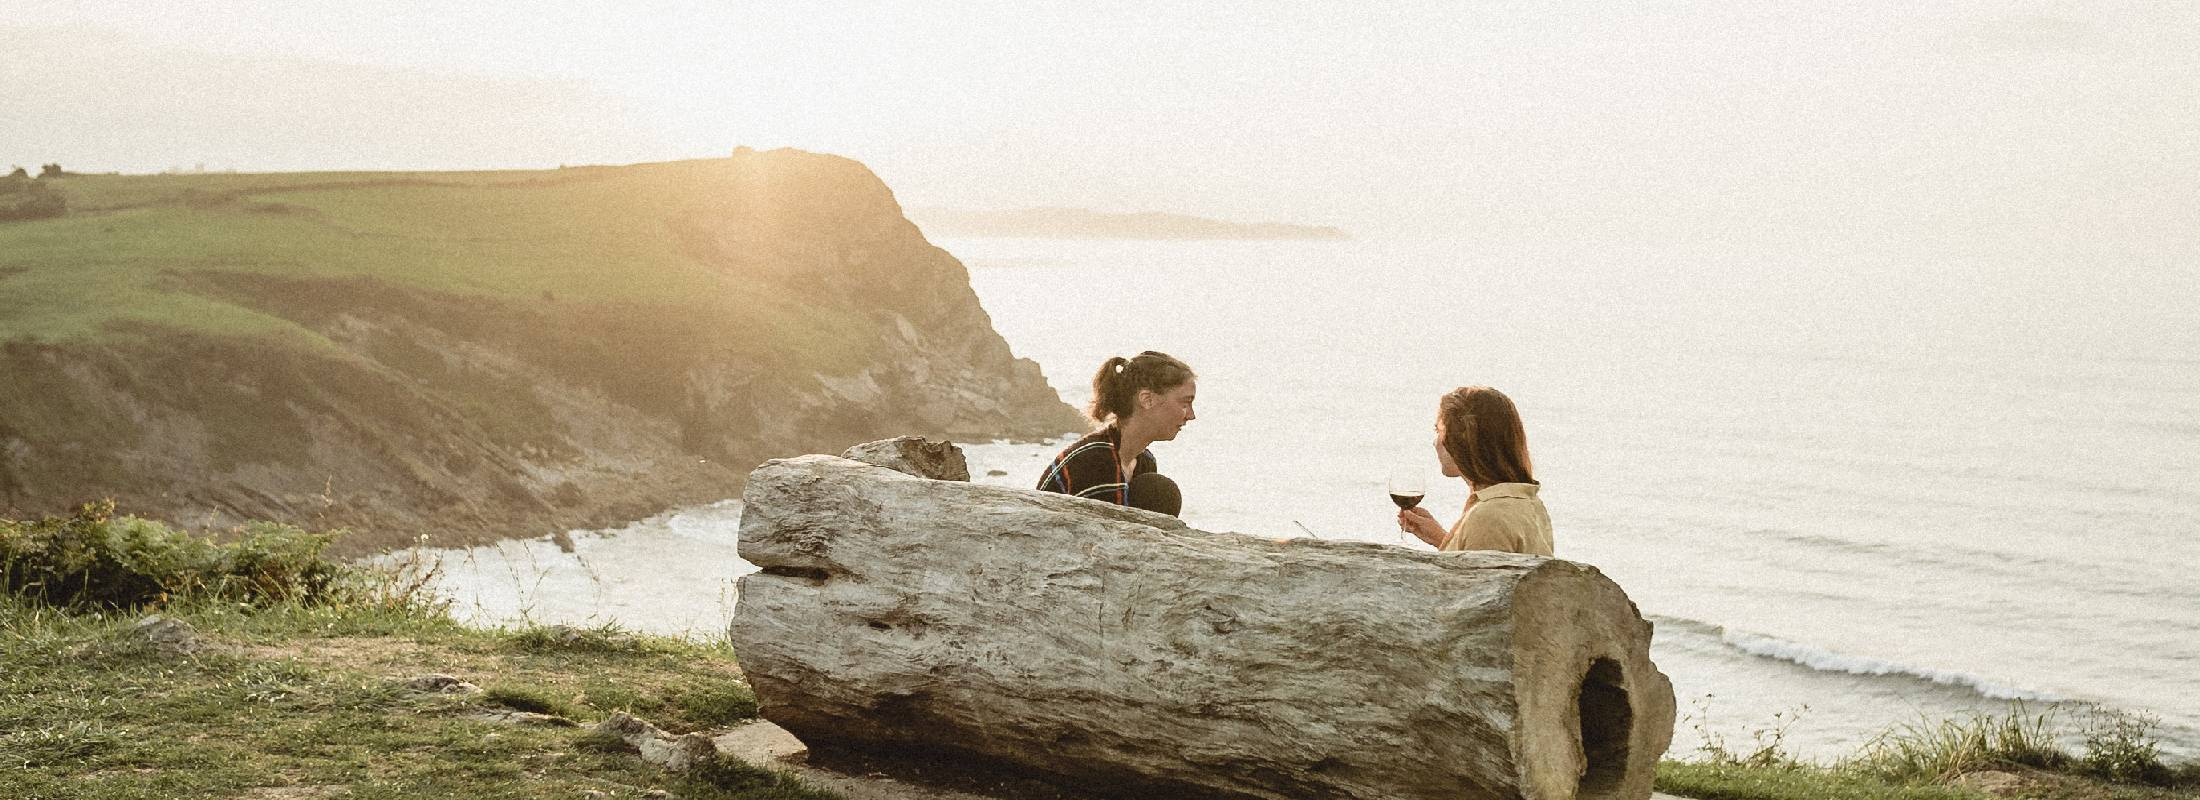 relax frente al mar en cantabria